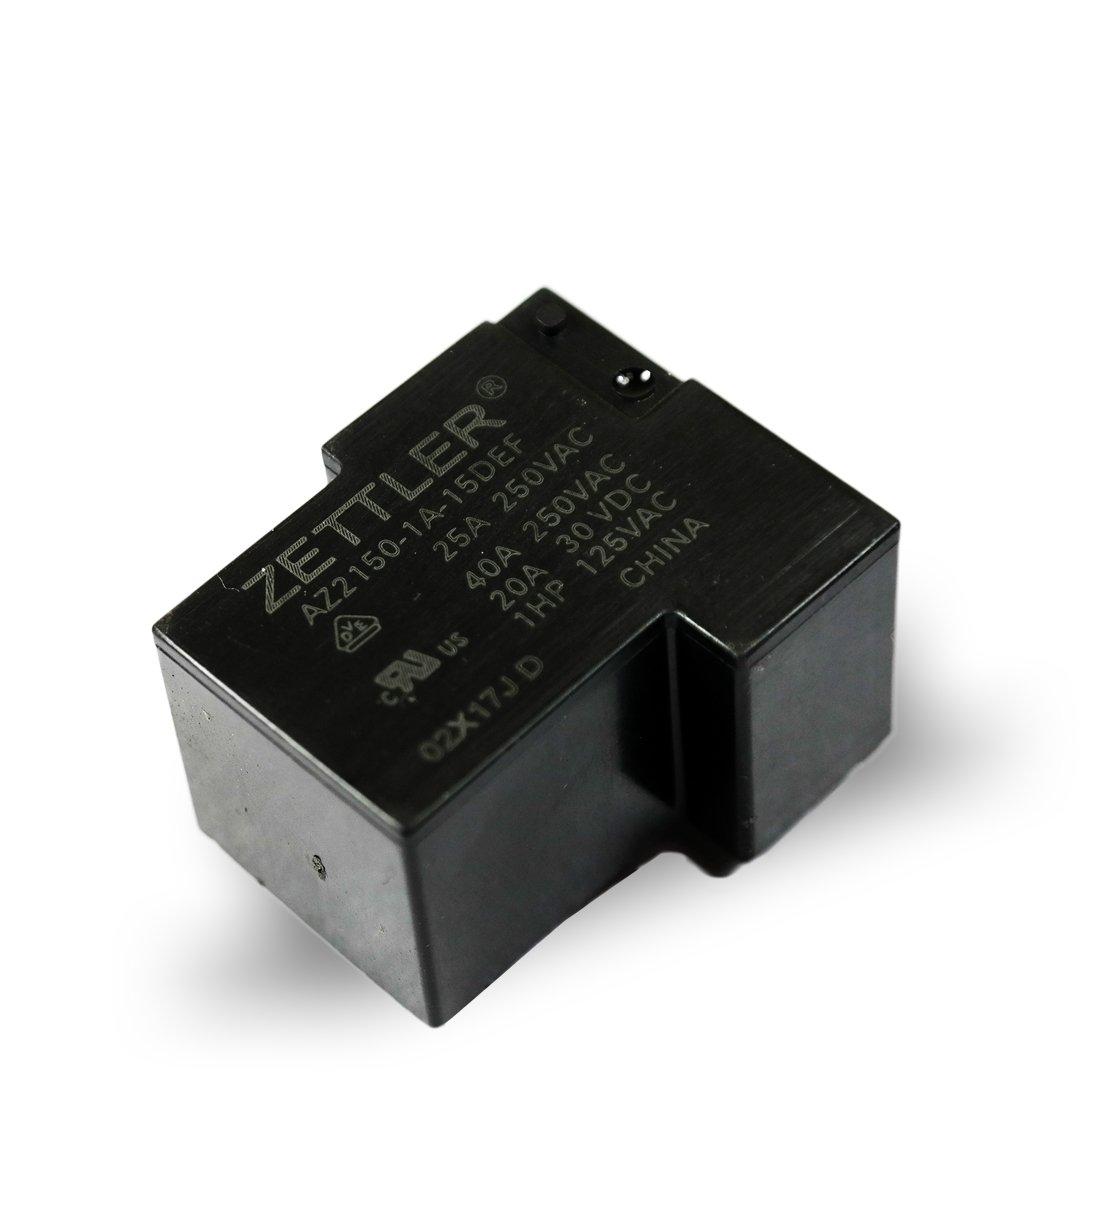 American Zettler AZ2150-1A-15DE 15VDC 256 Ohm 40A SPST-NO THT Power Relay